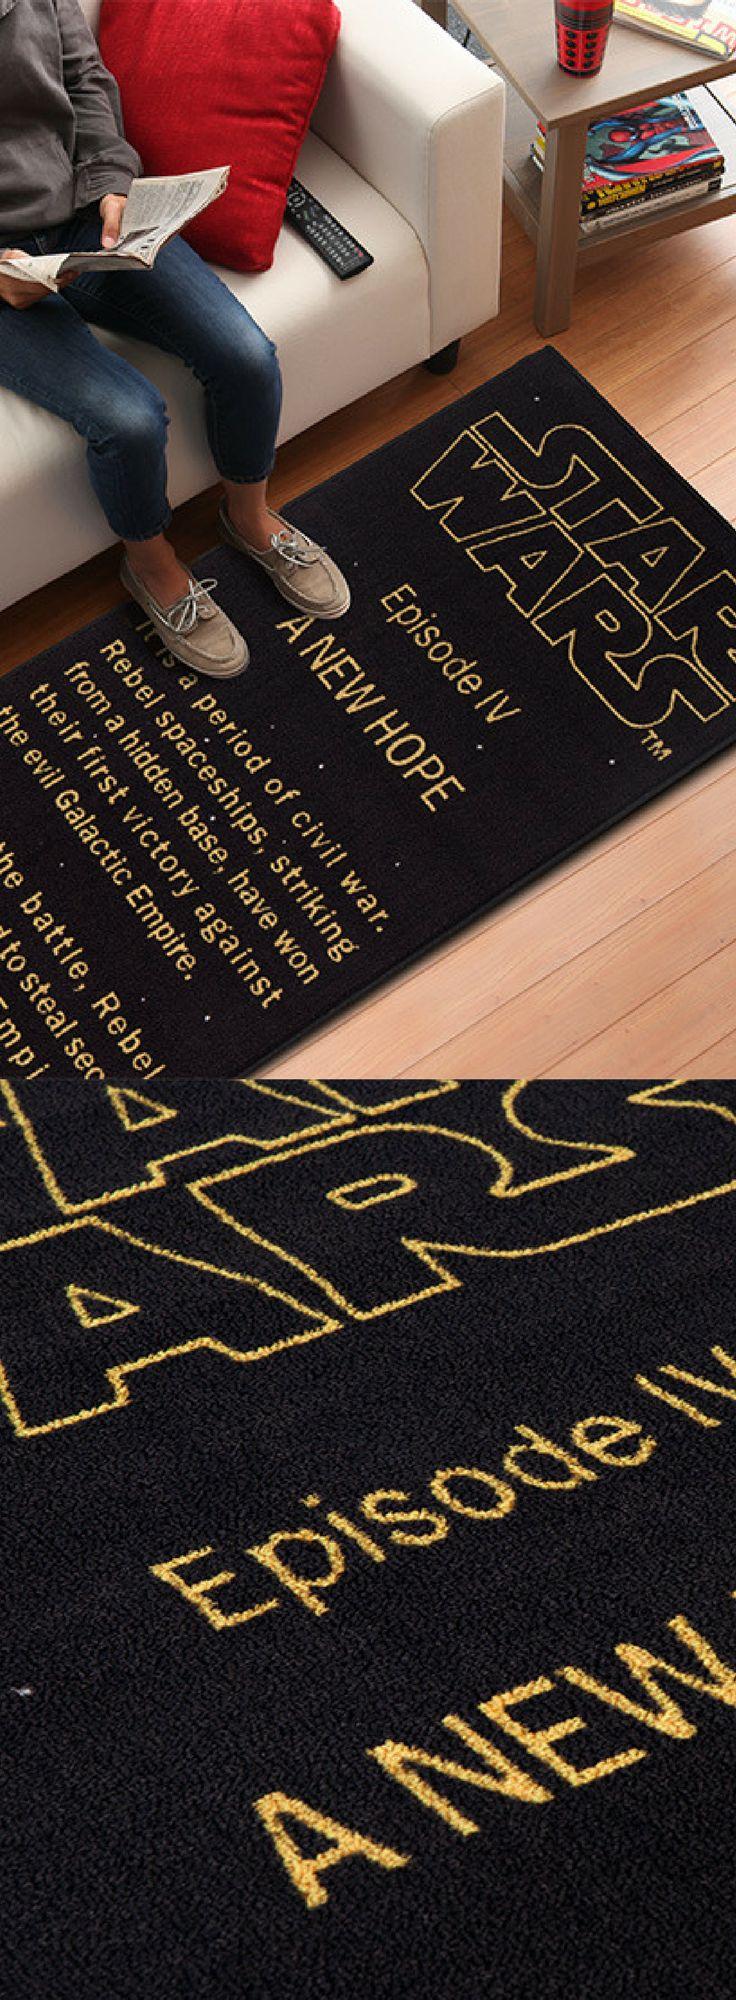 Star Wars Floor Rug - Star Wars Gifts #starwars #rug #home